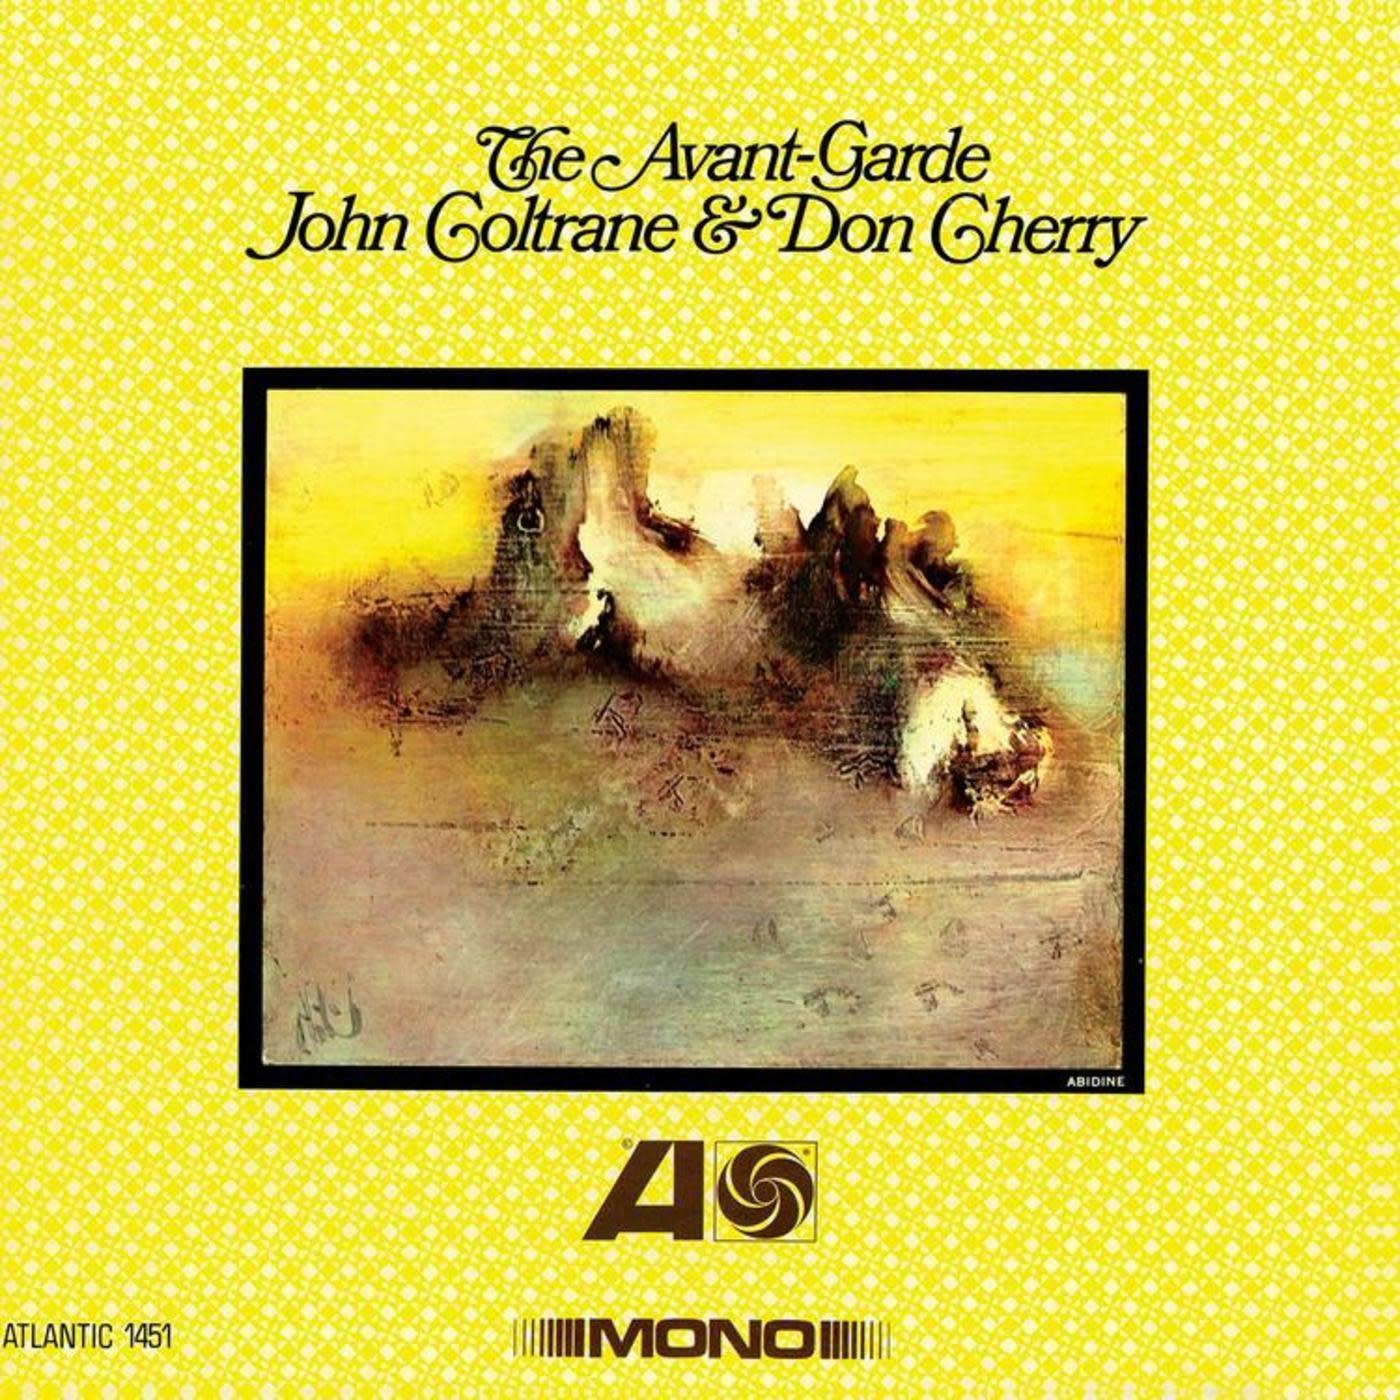 John Coltrane & Don Cherry • The Avant-Garde-1